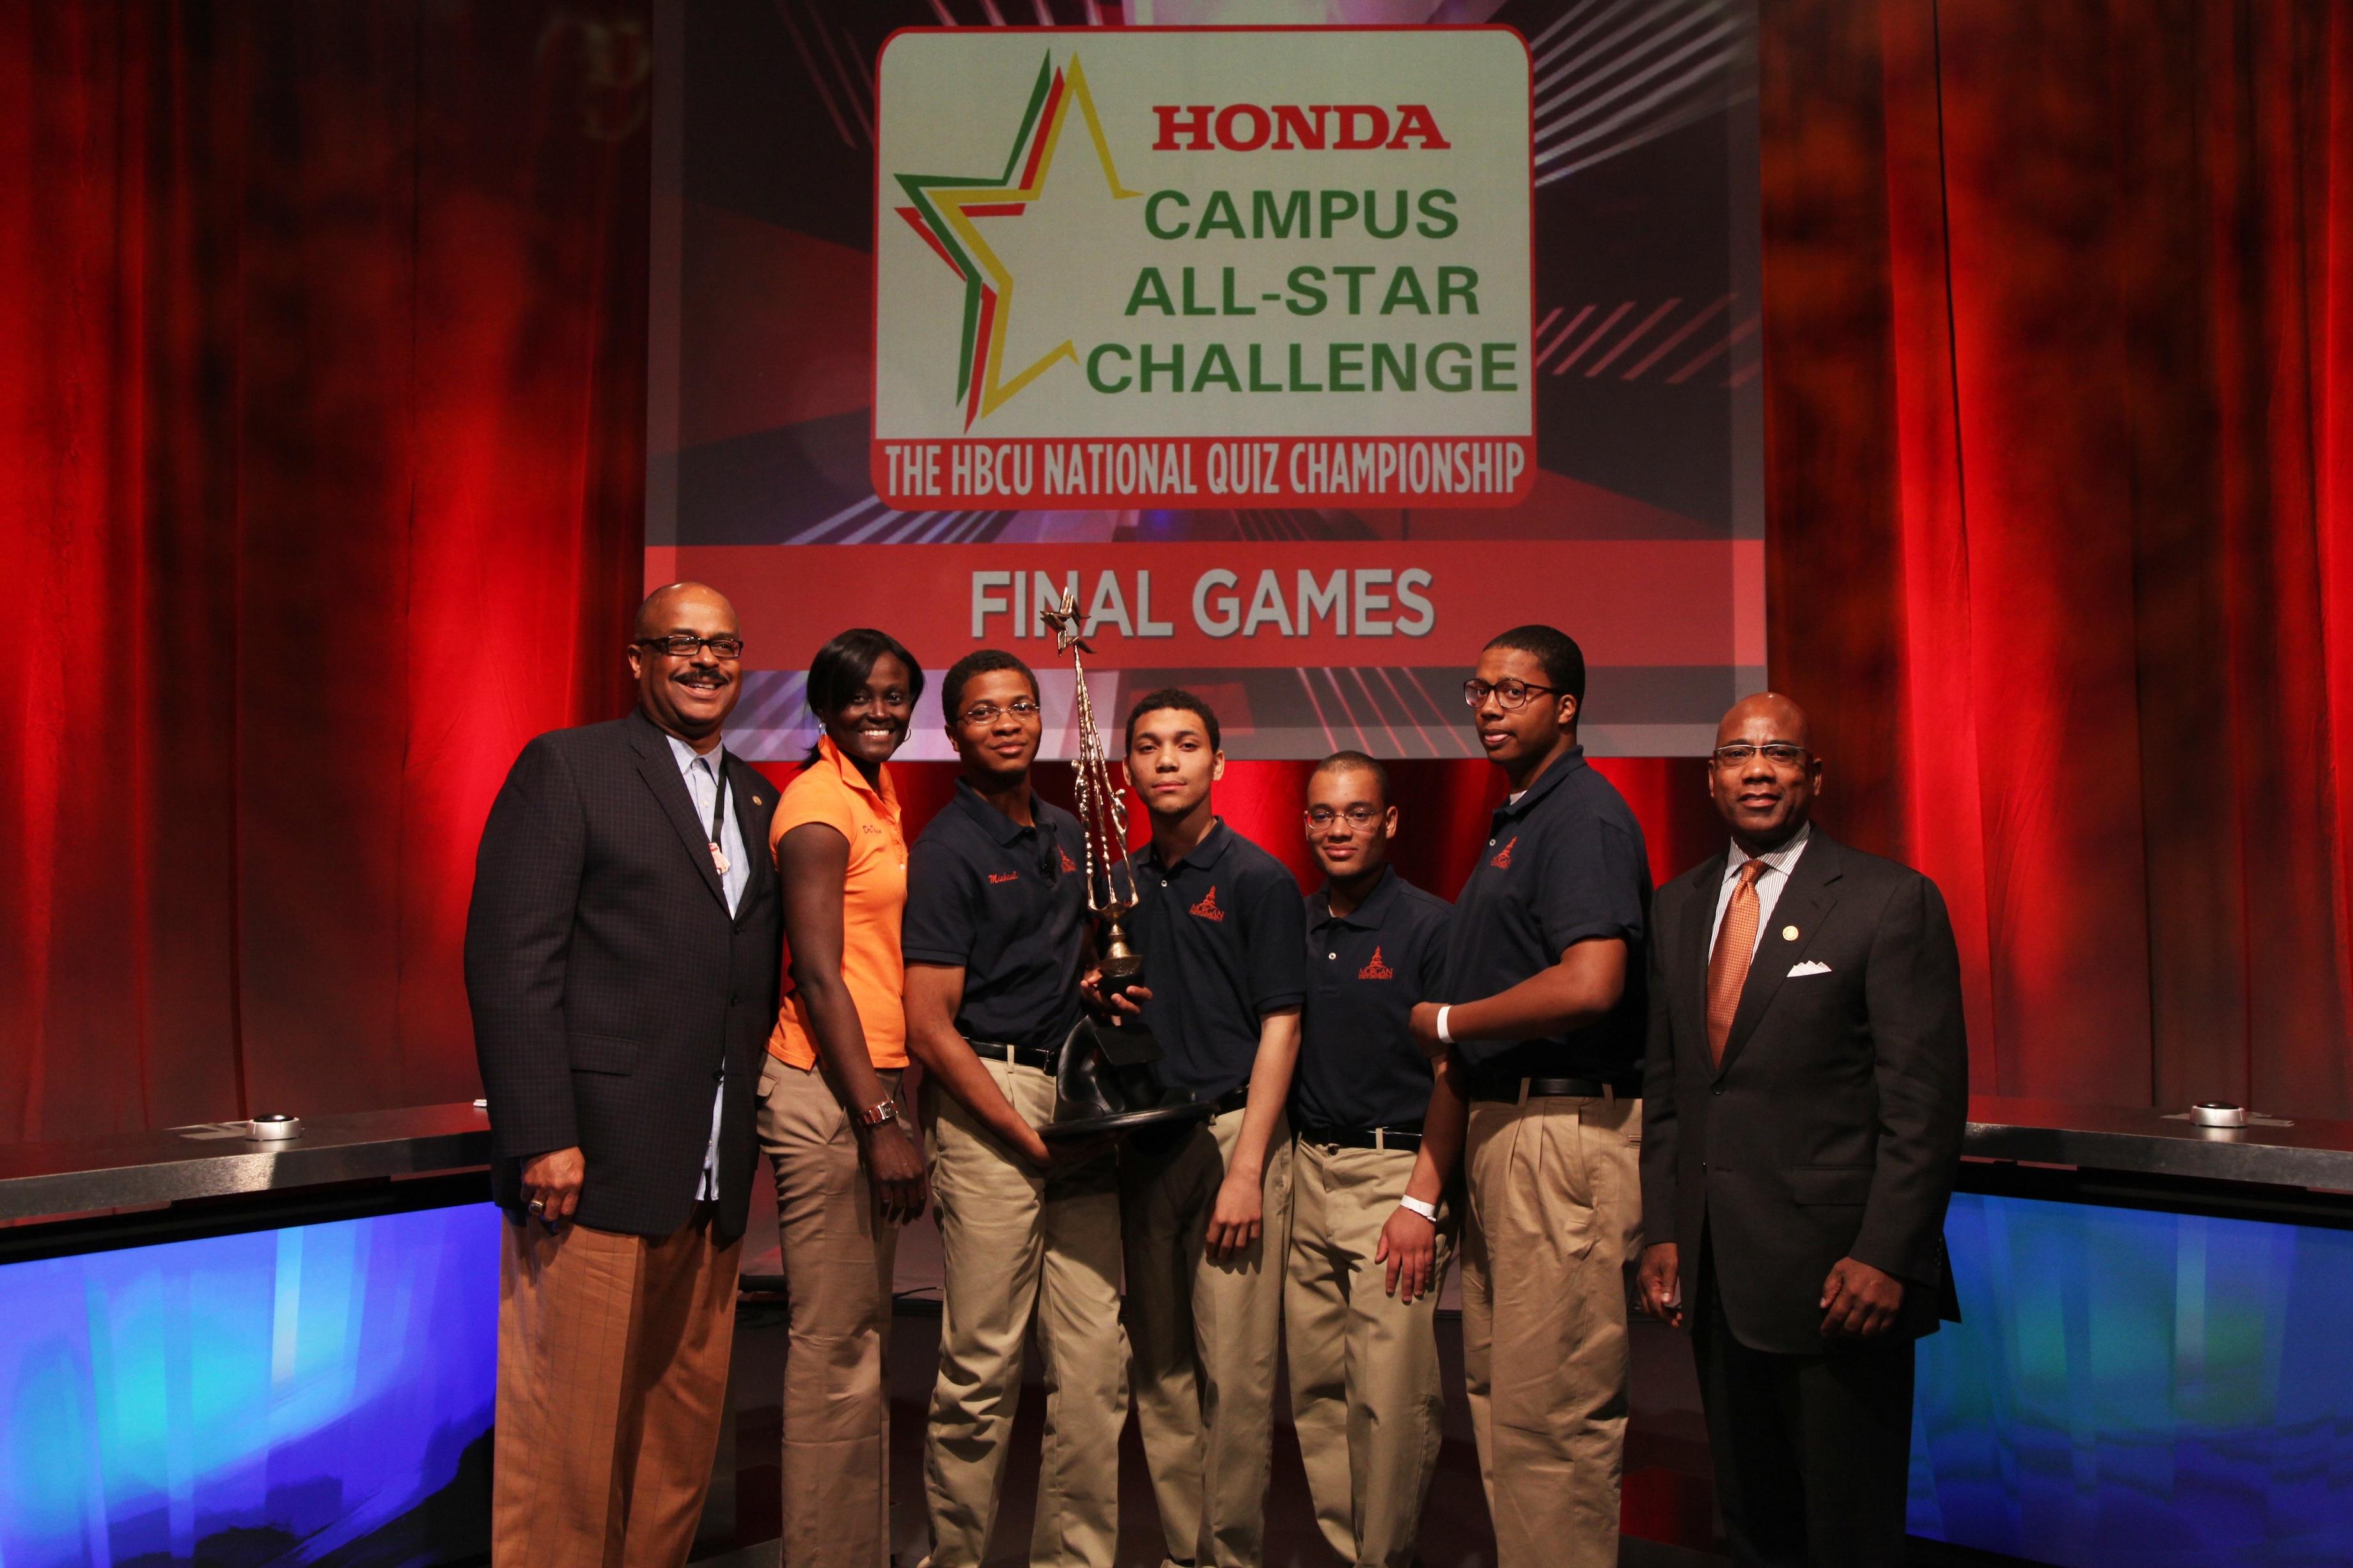 Honda Campus All-Star Challenge – Final Games